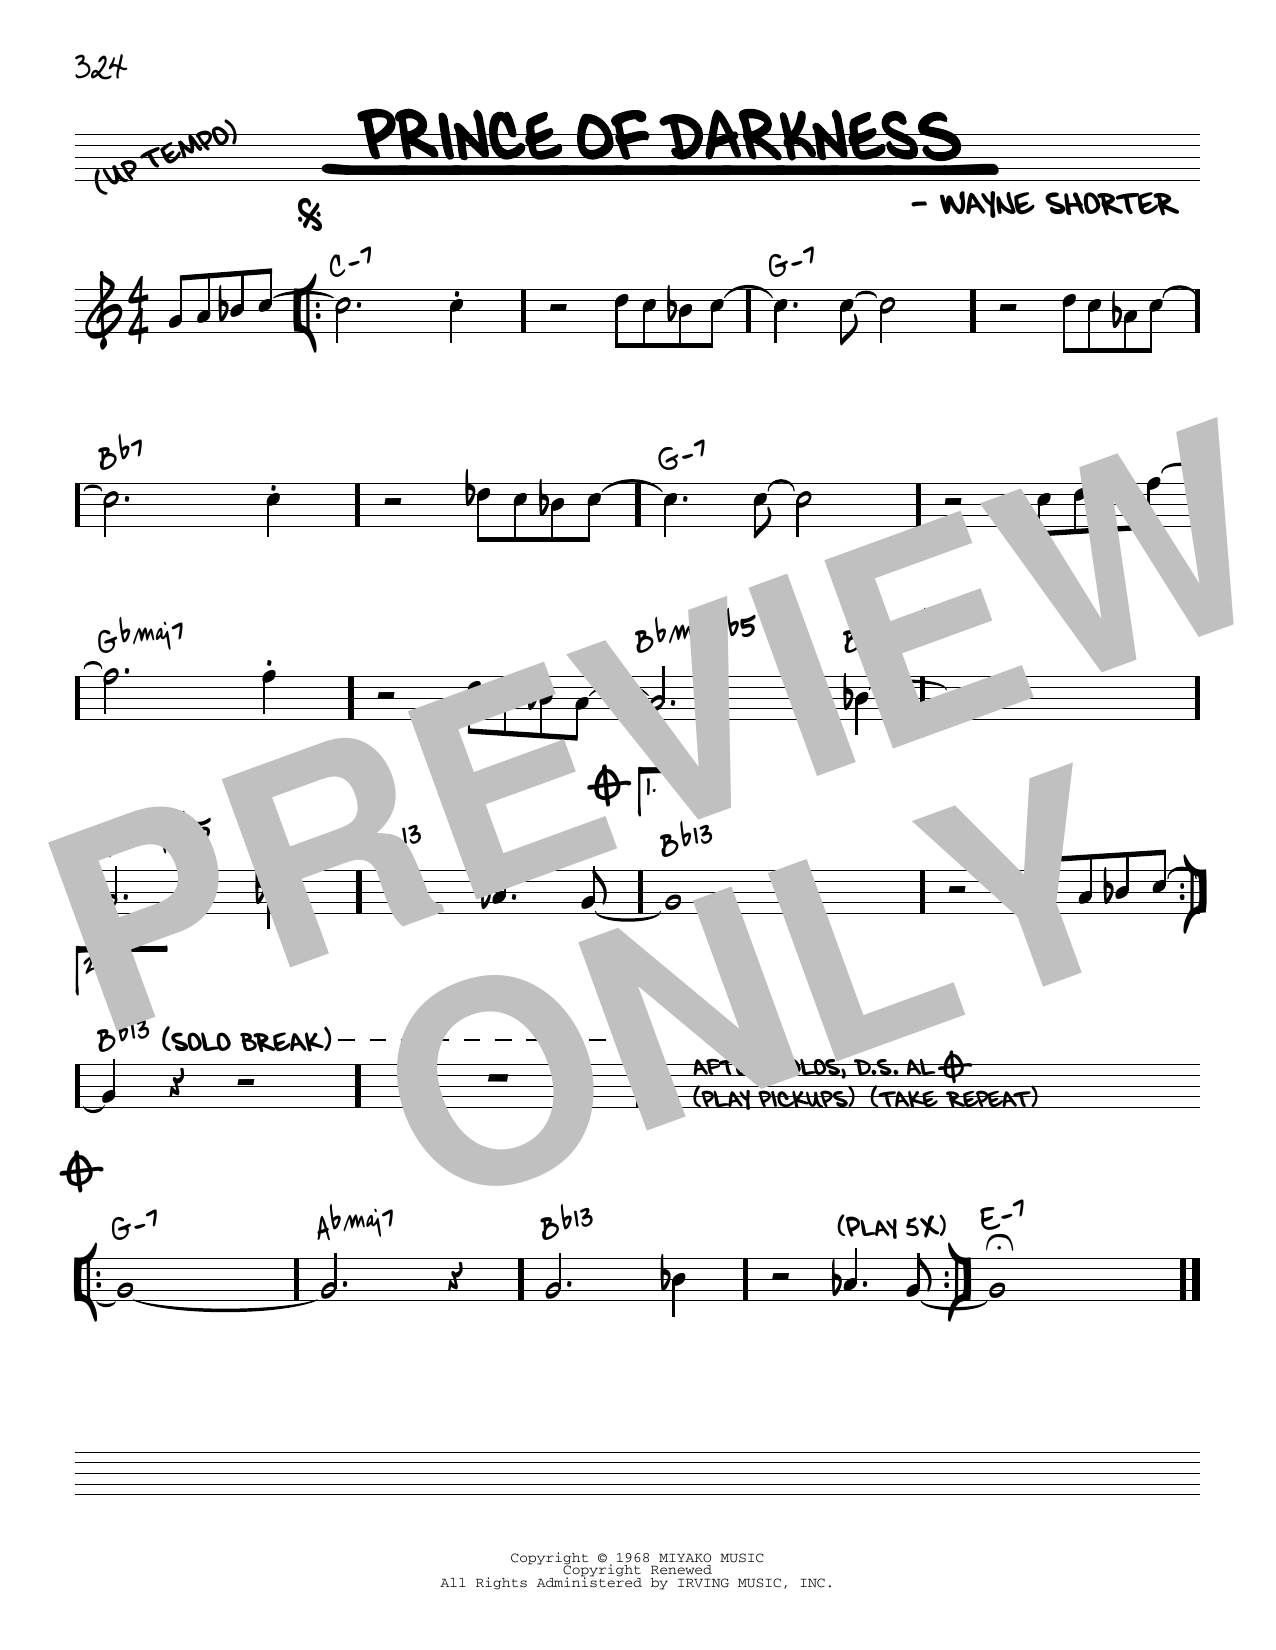 Wayne Shorter Prince Of Darkness [Reharmonized version] (arr. Jack Grassel) sheet music notes printable PDF score